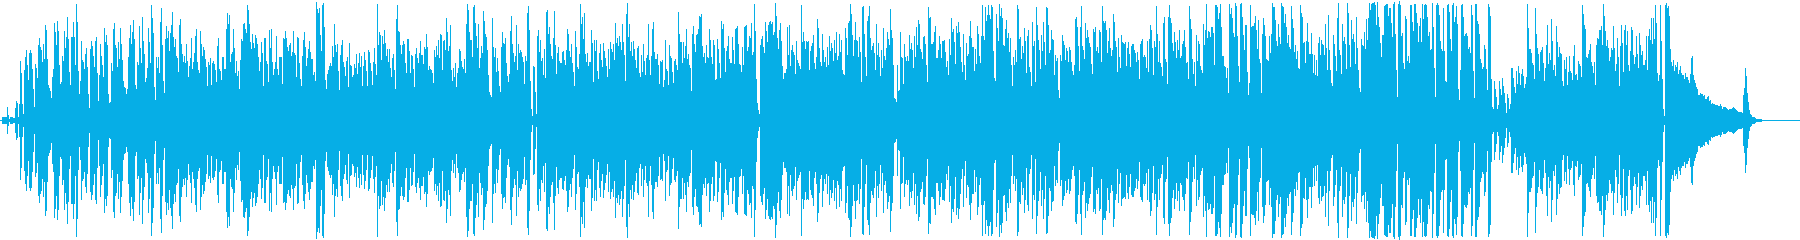 Confirmation ジャズの名曲の再生済みの波形